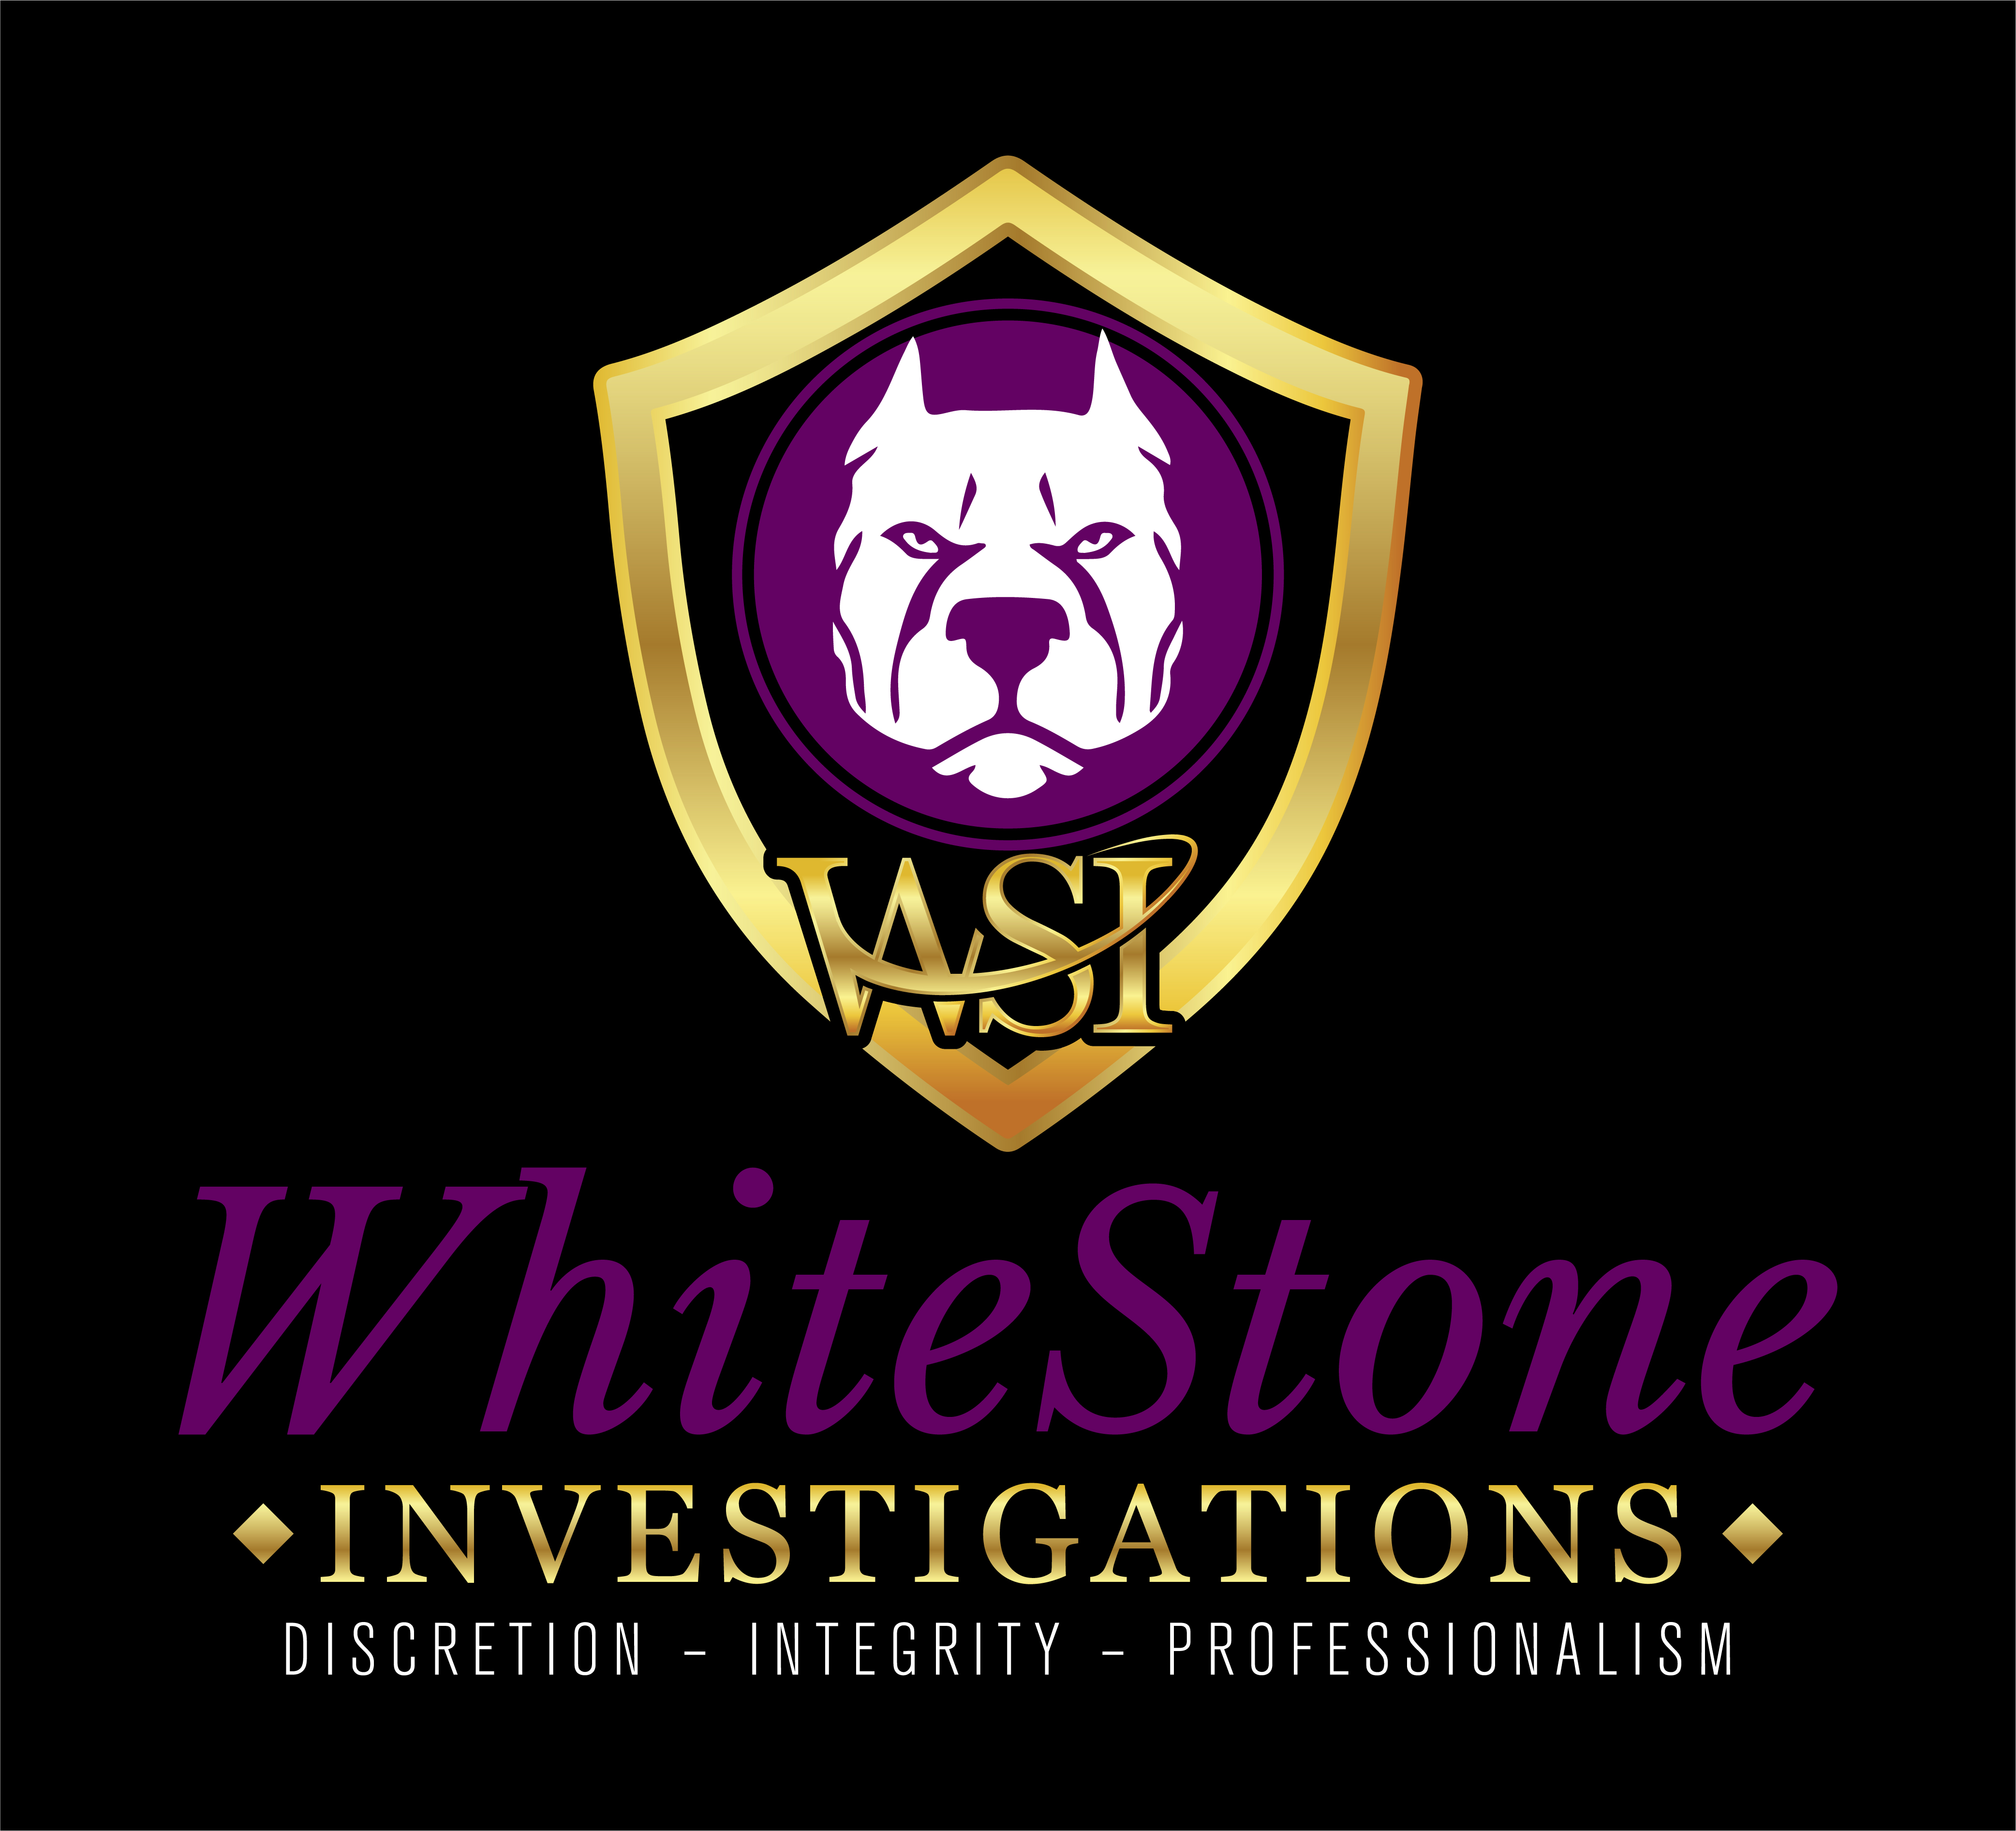 WhiteStone Investigations, Inc. - Black Owned